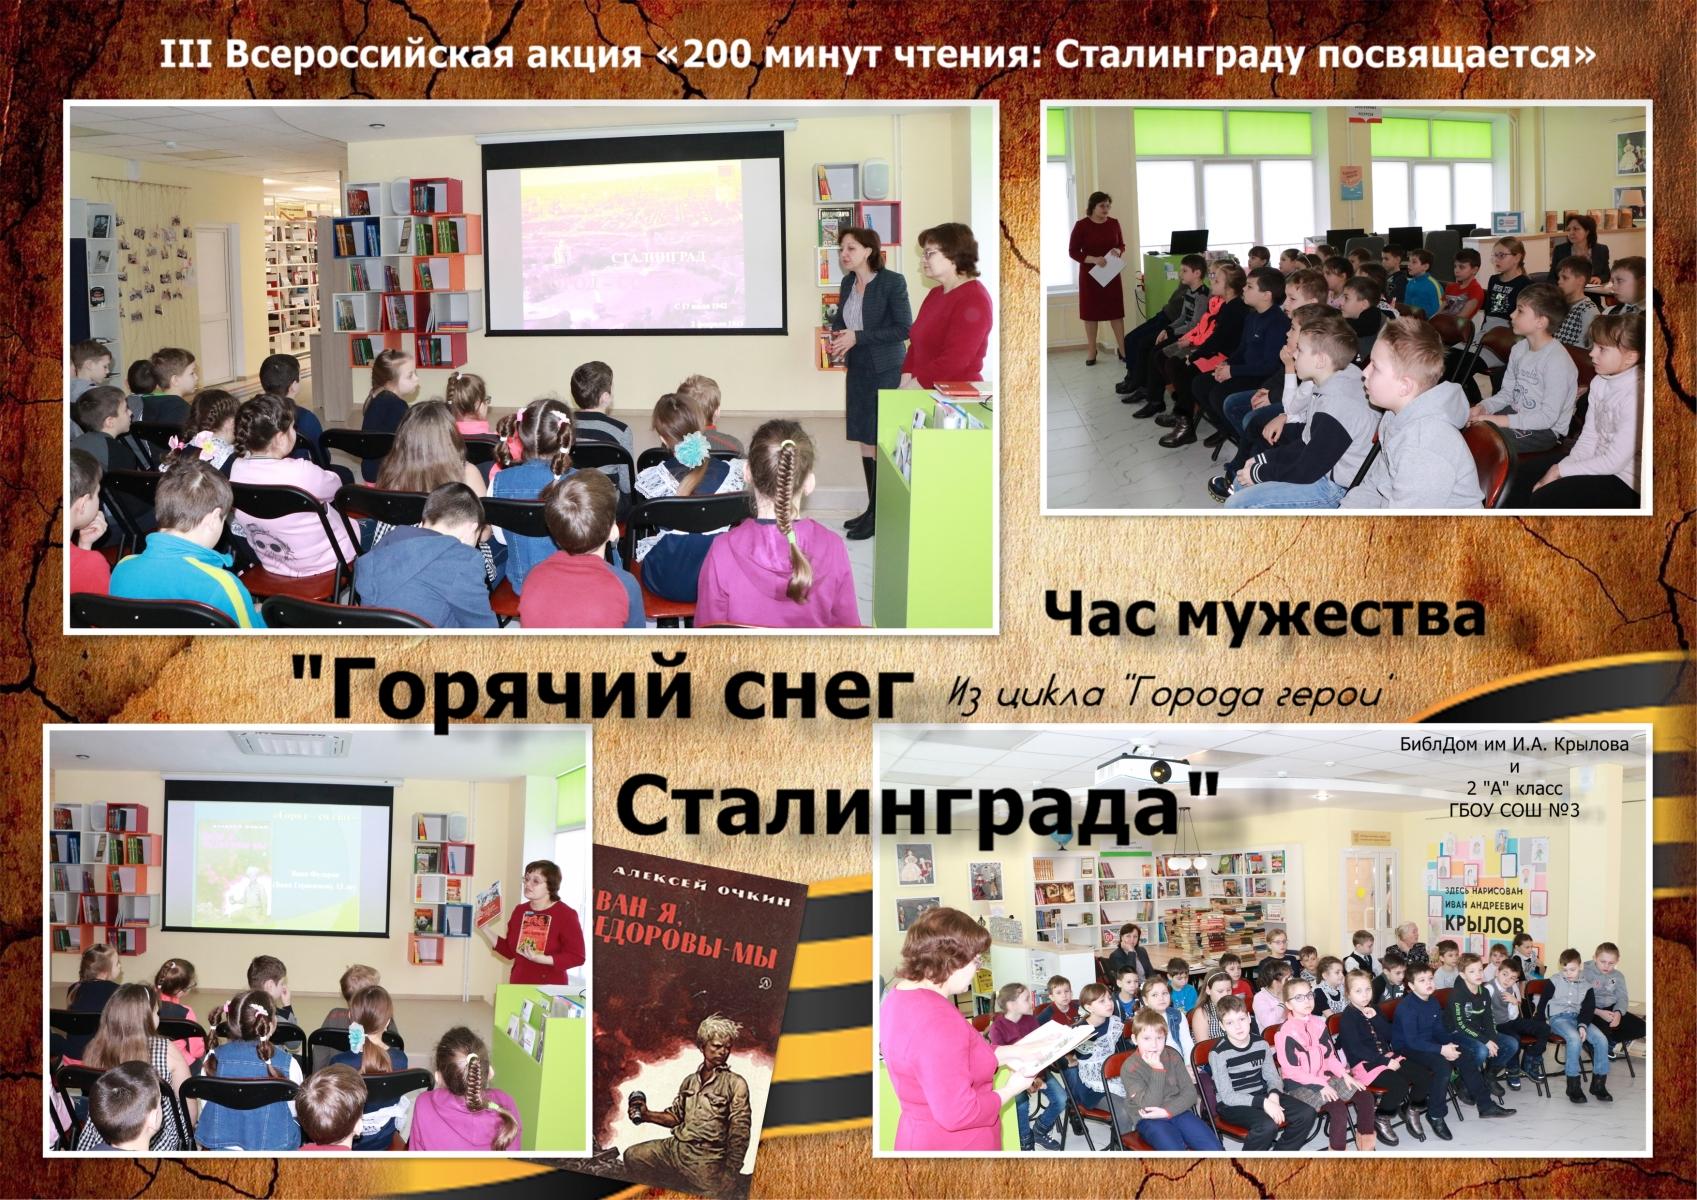 """Горячий снег Сталинграда"""